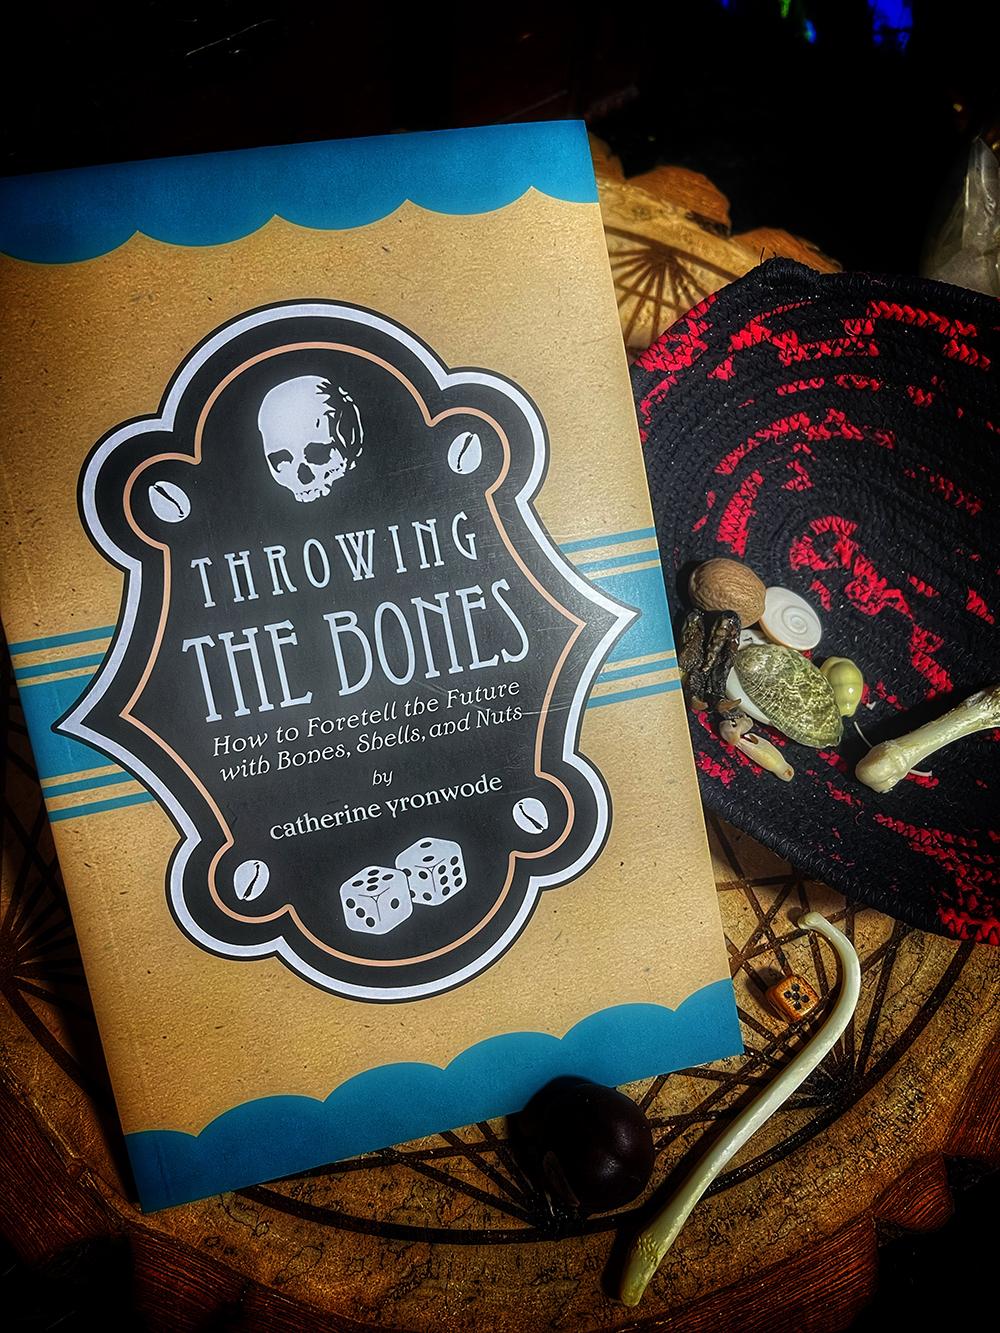 Book, Bowl, & Bone Reading Set